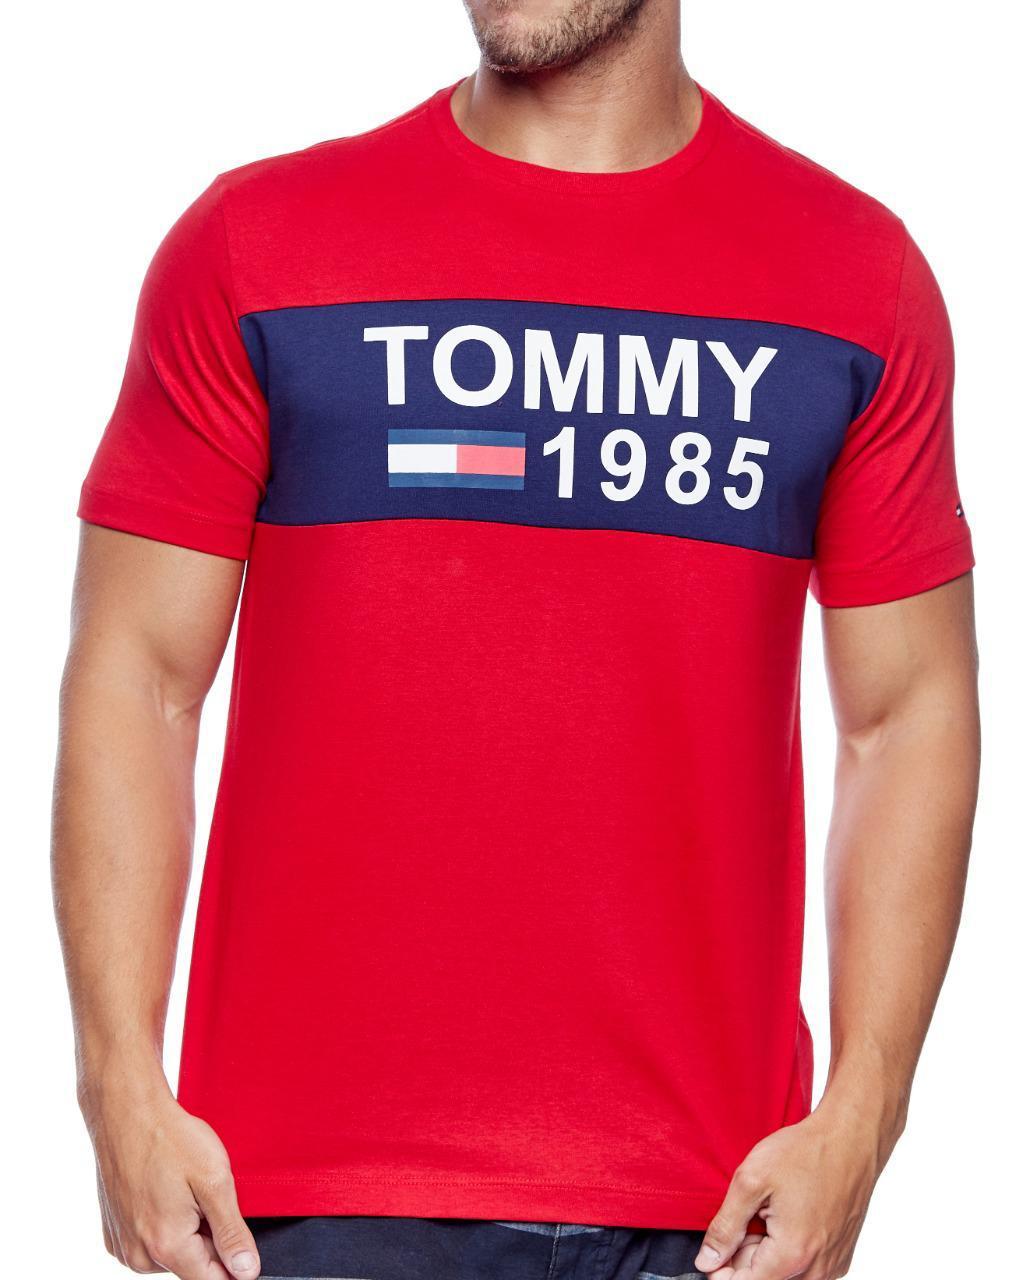 Camiseta Tommy Hilfiger Masculina Custom Fit Coupe Flag 1985 Vermelho